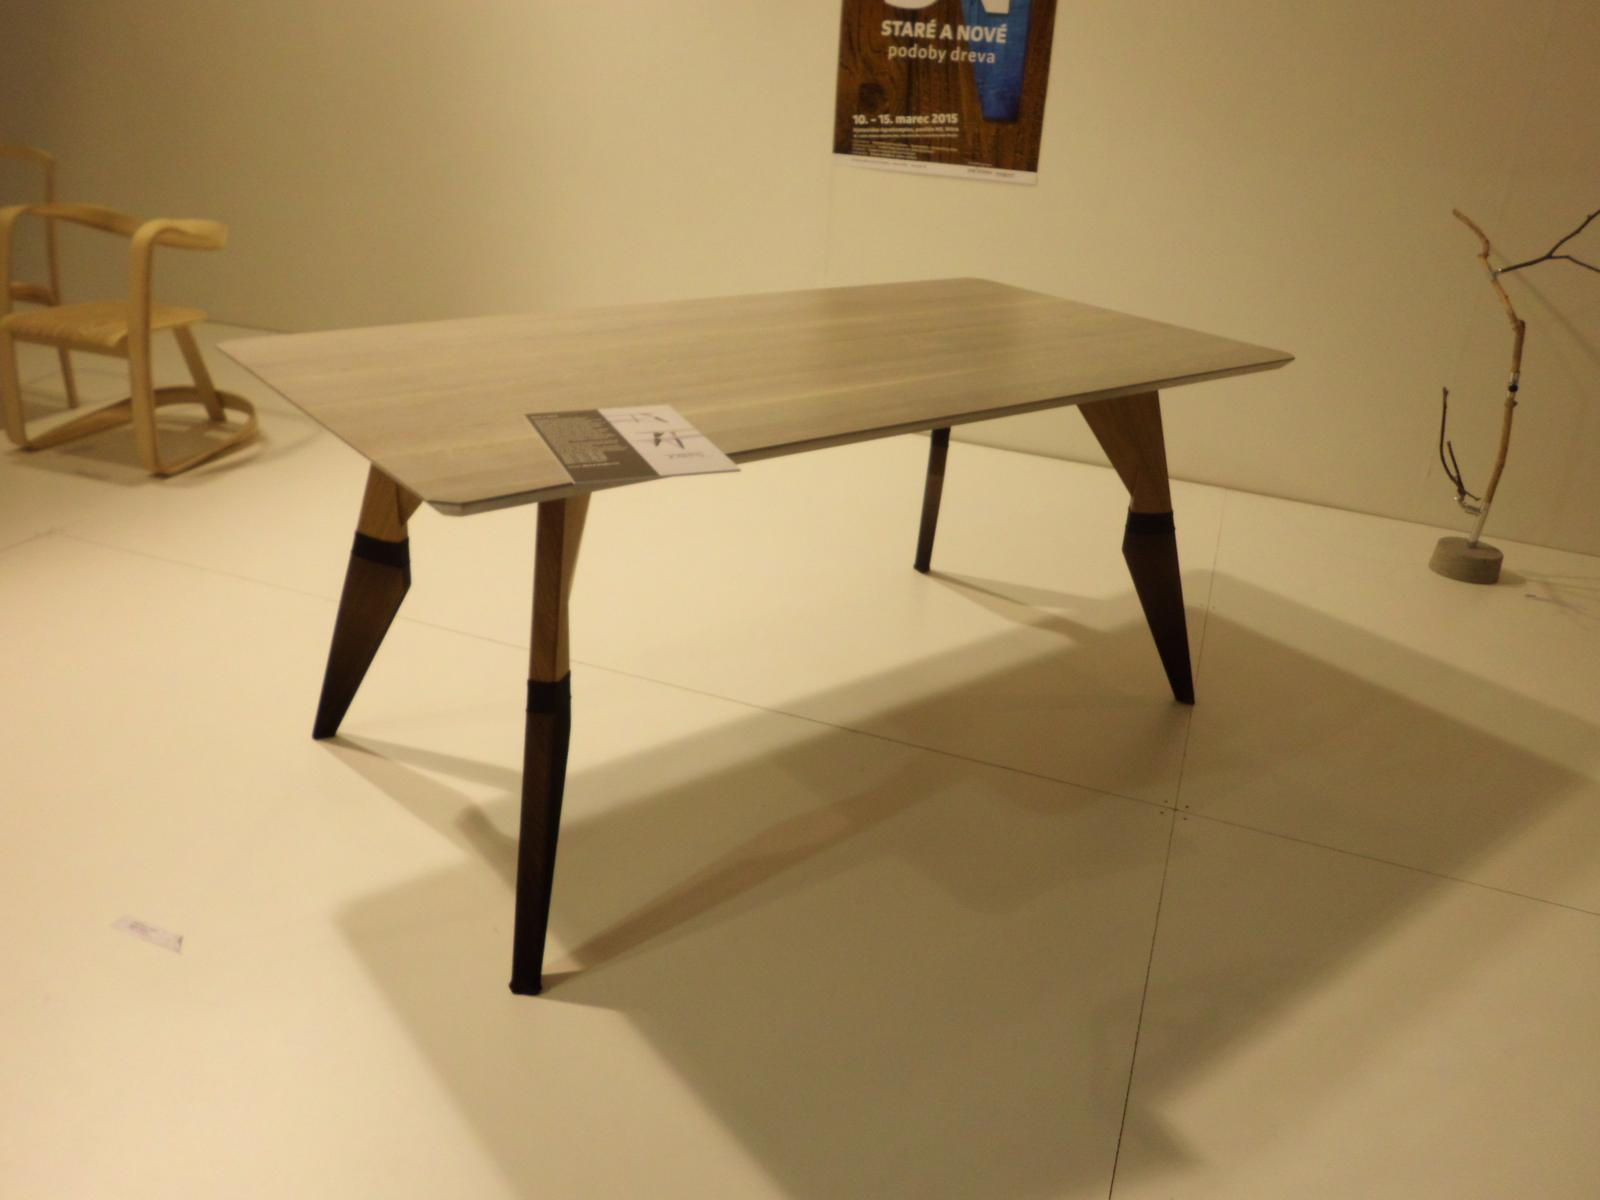 Výstava Nitra 2015 mojimi očami...:) - karpiš stoly so silonkami...novinka :)